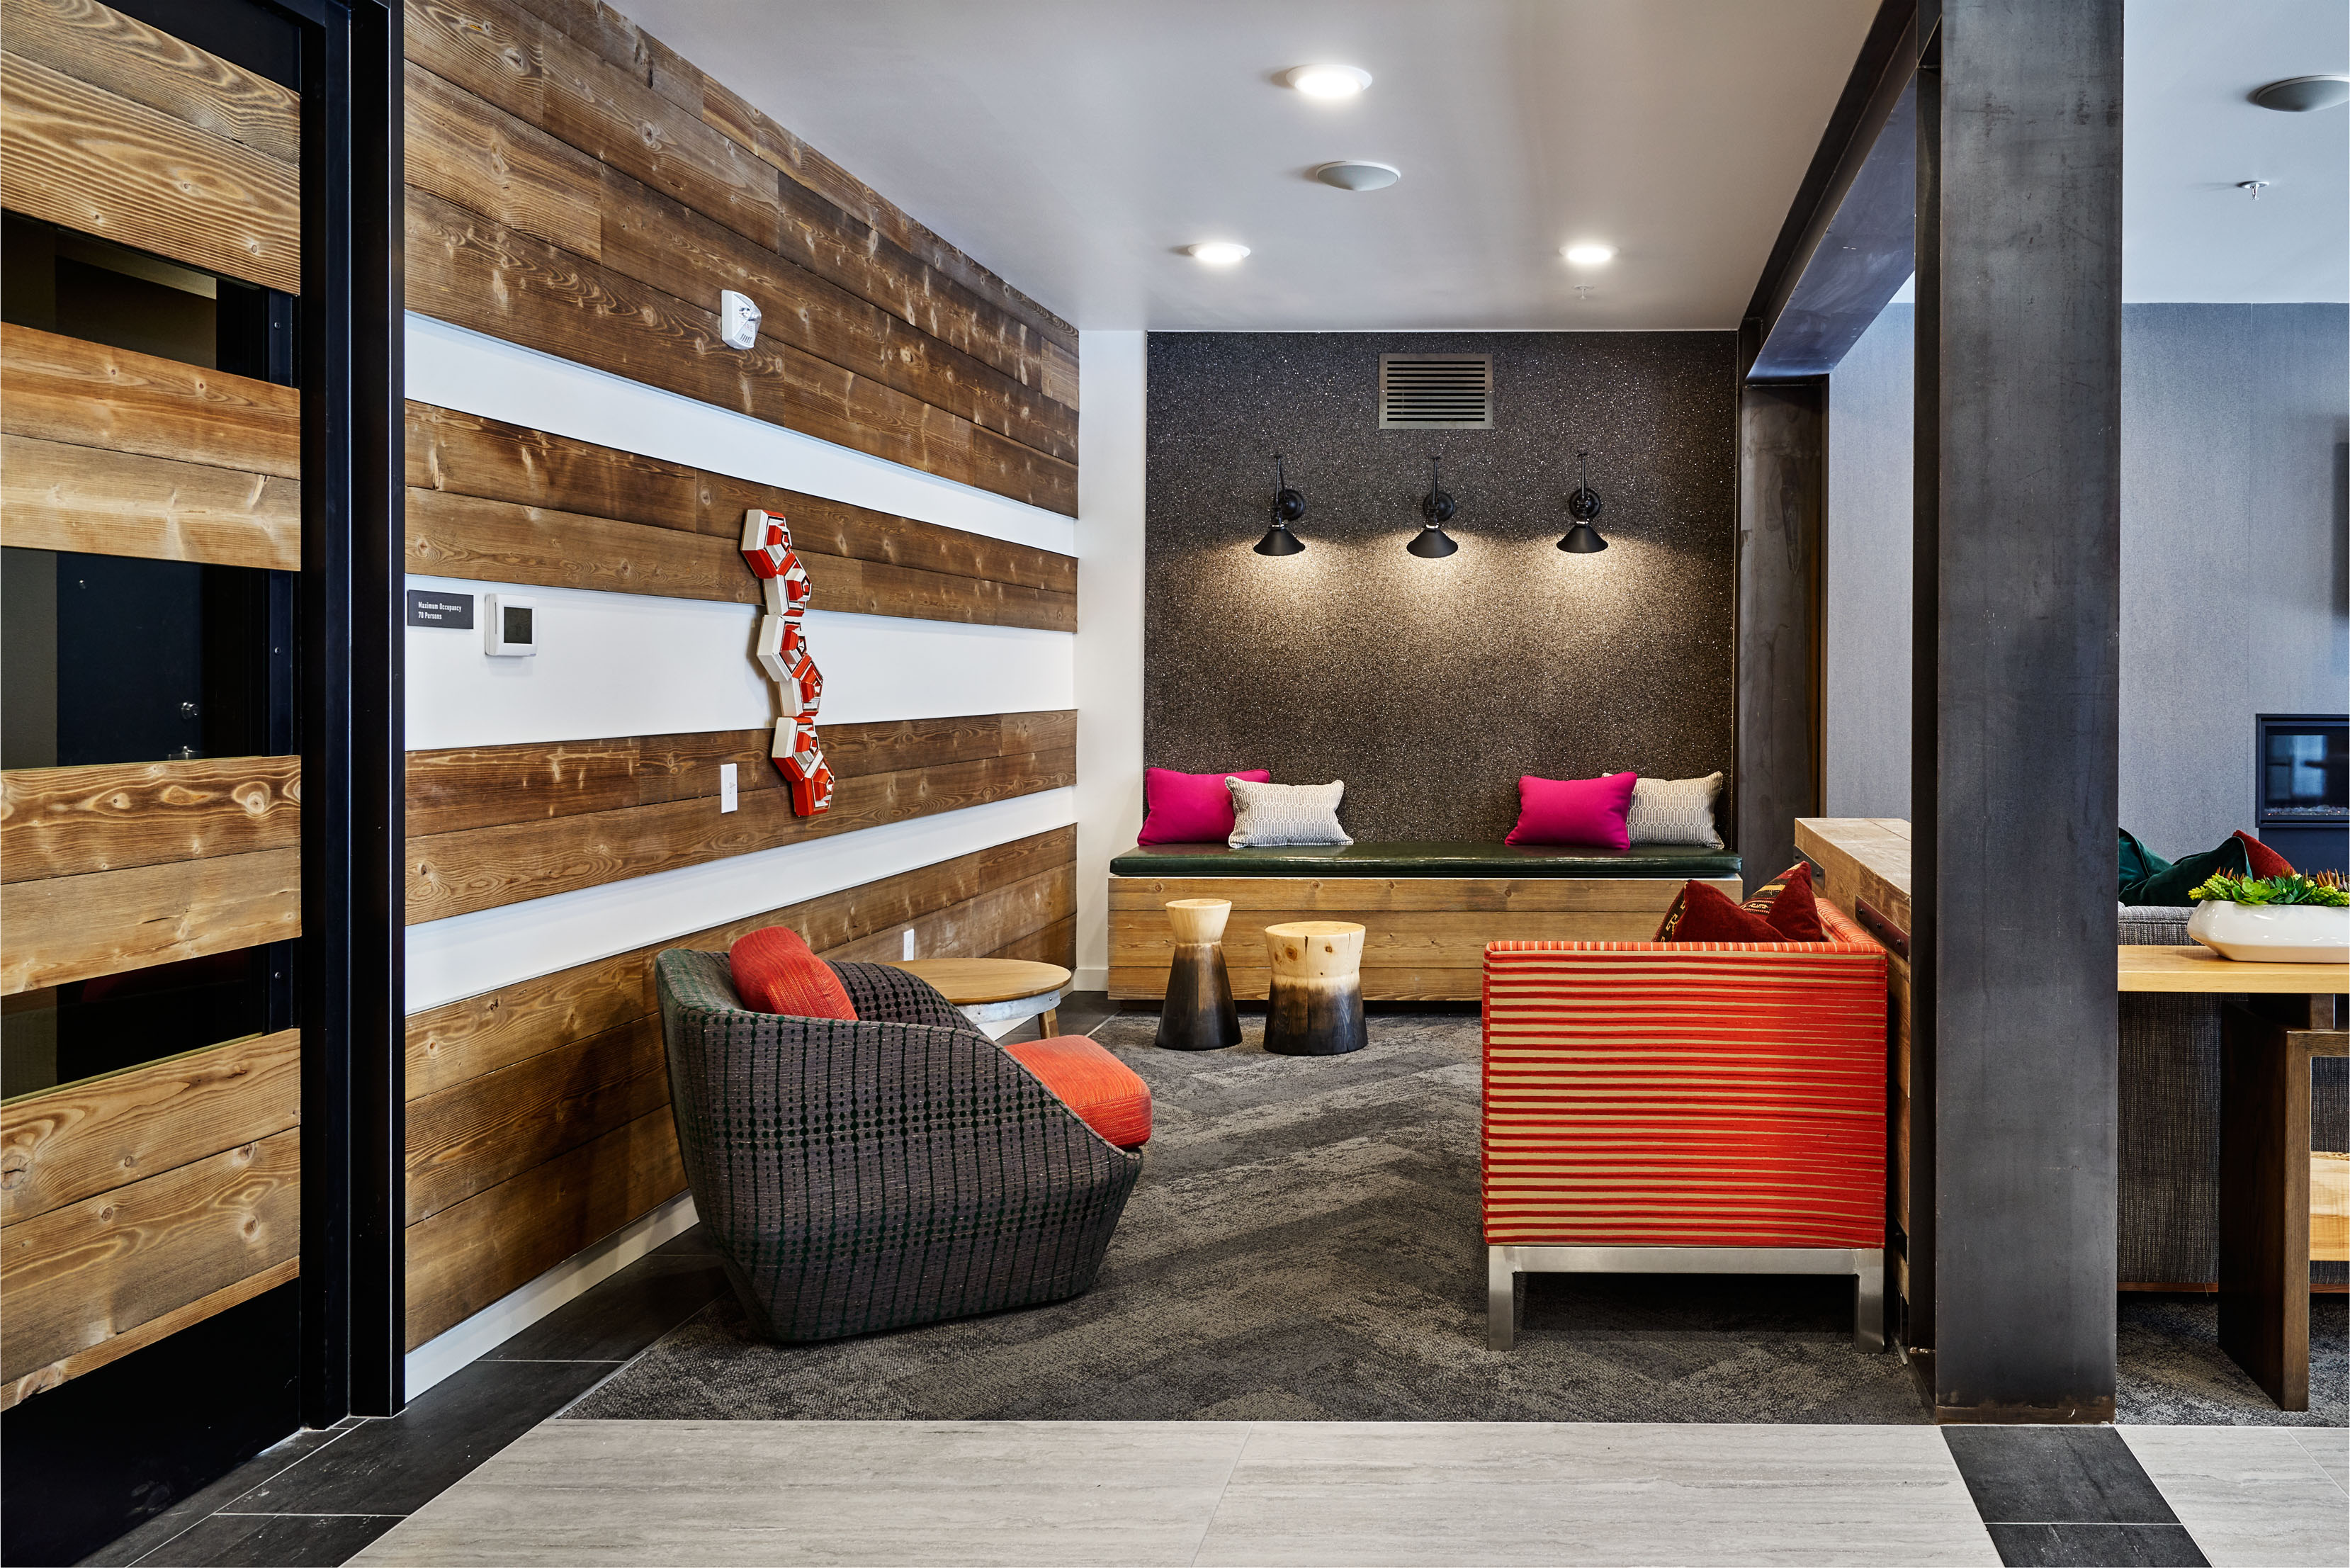 Portland Interior Design Firm Uses Creative Color ...